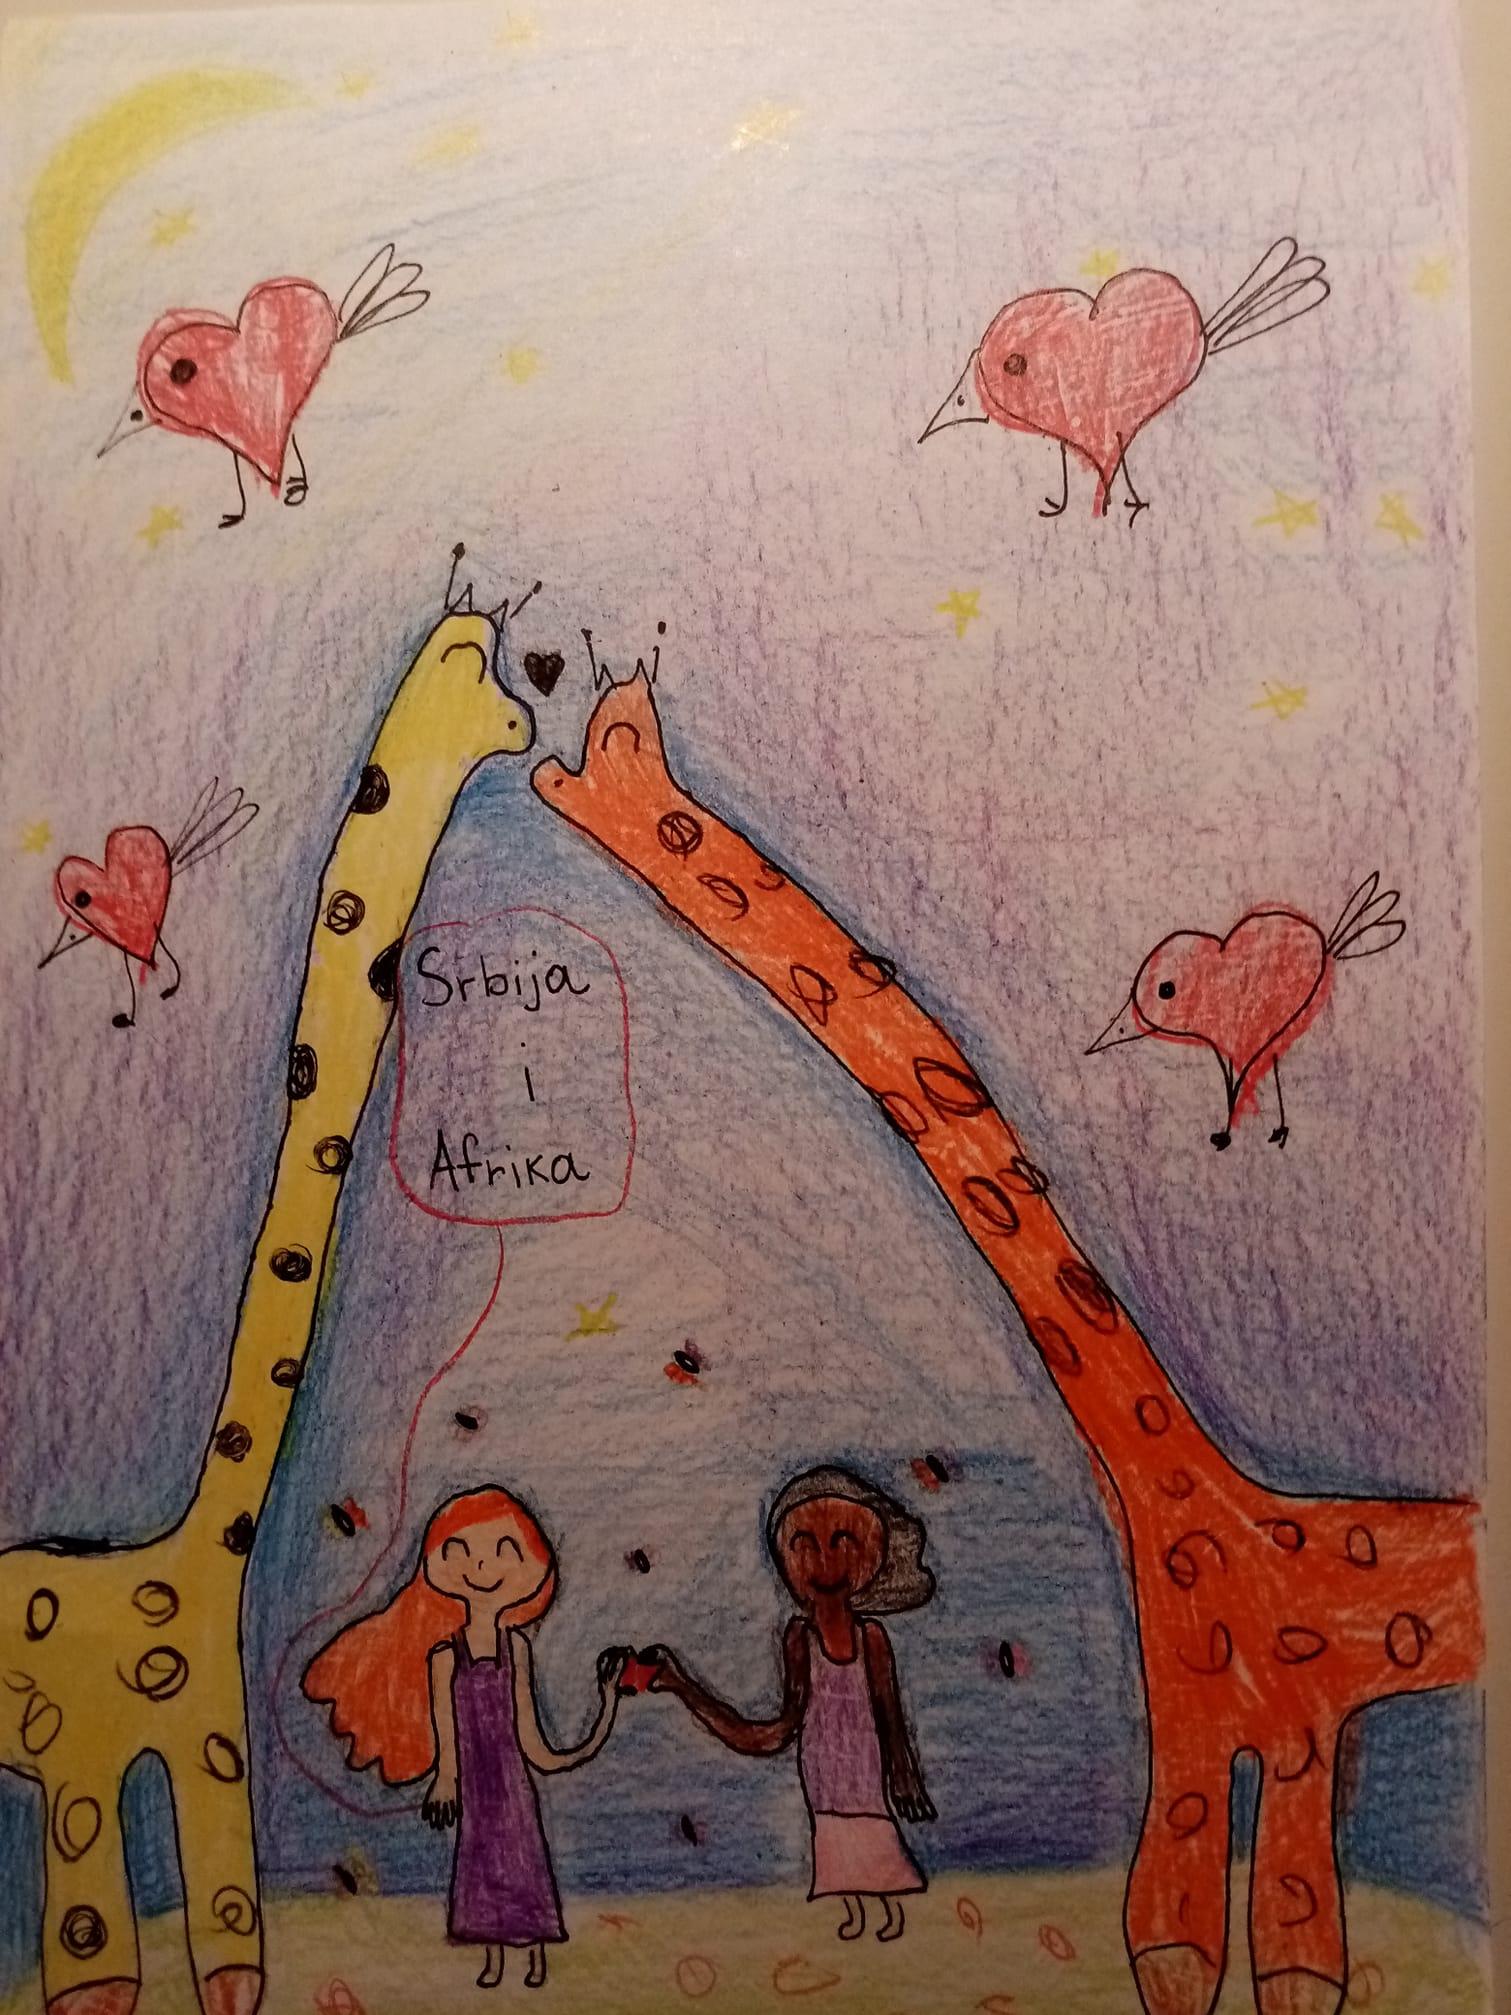 Crtež Srbija i Afrika